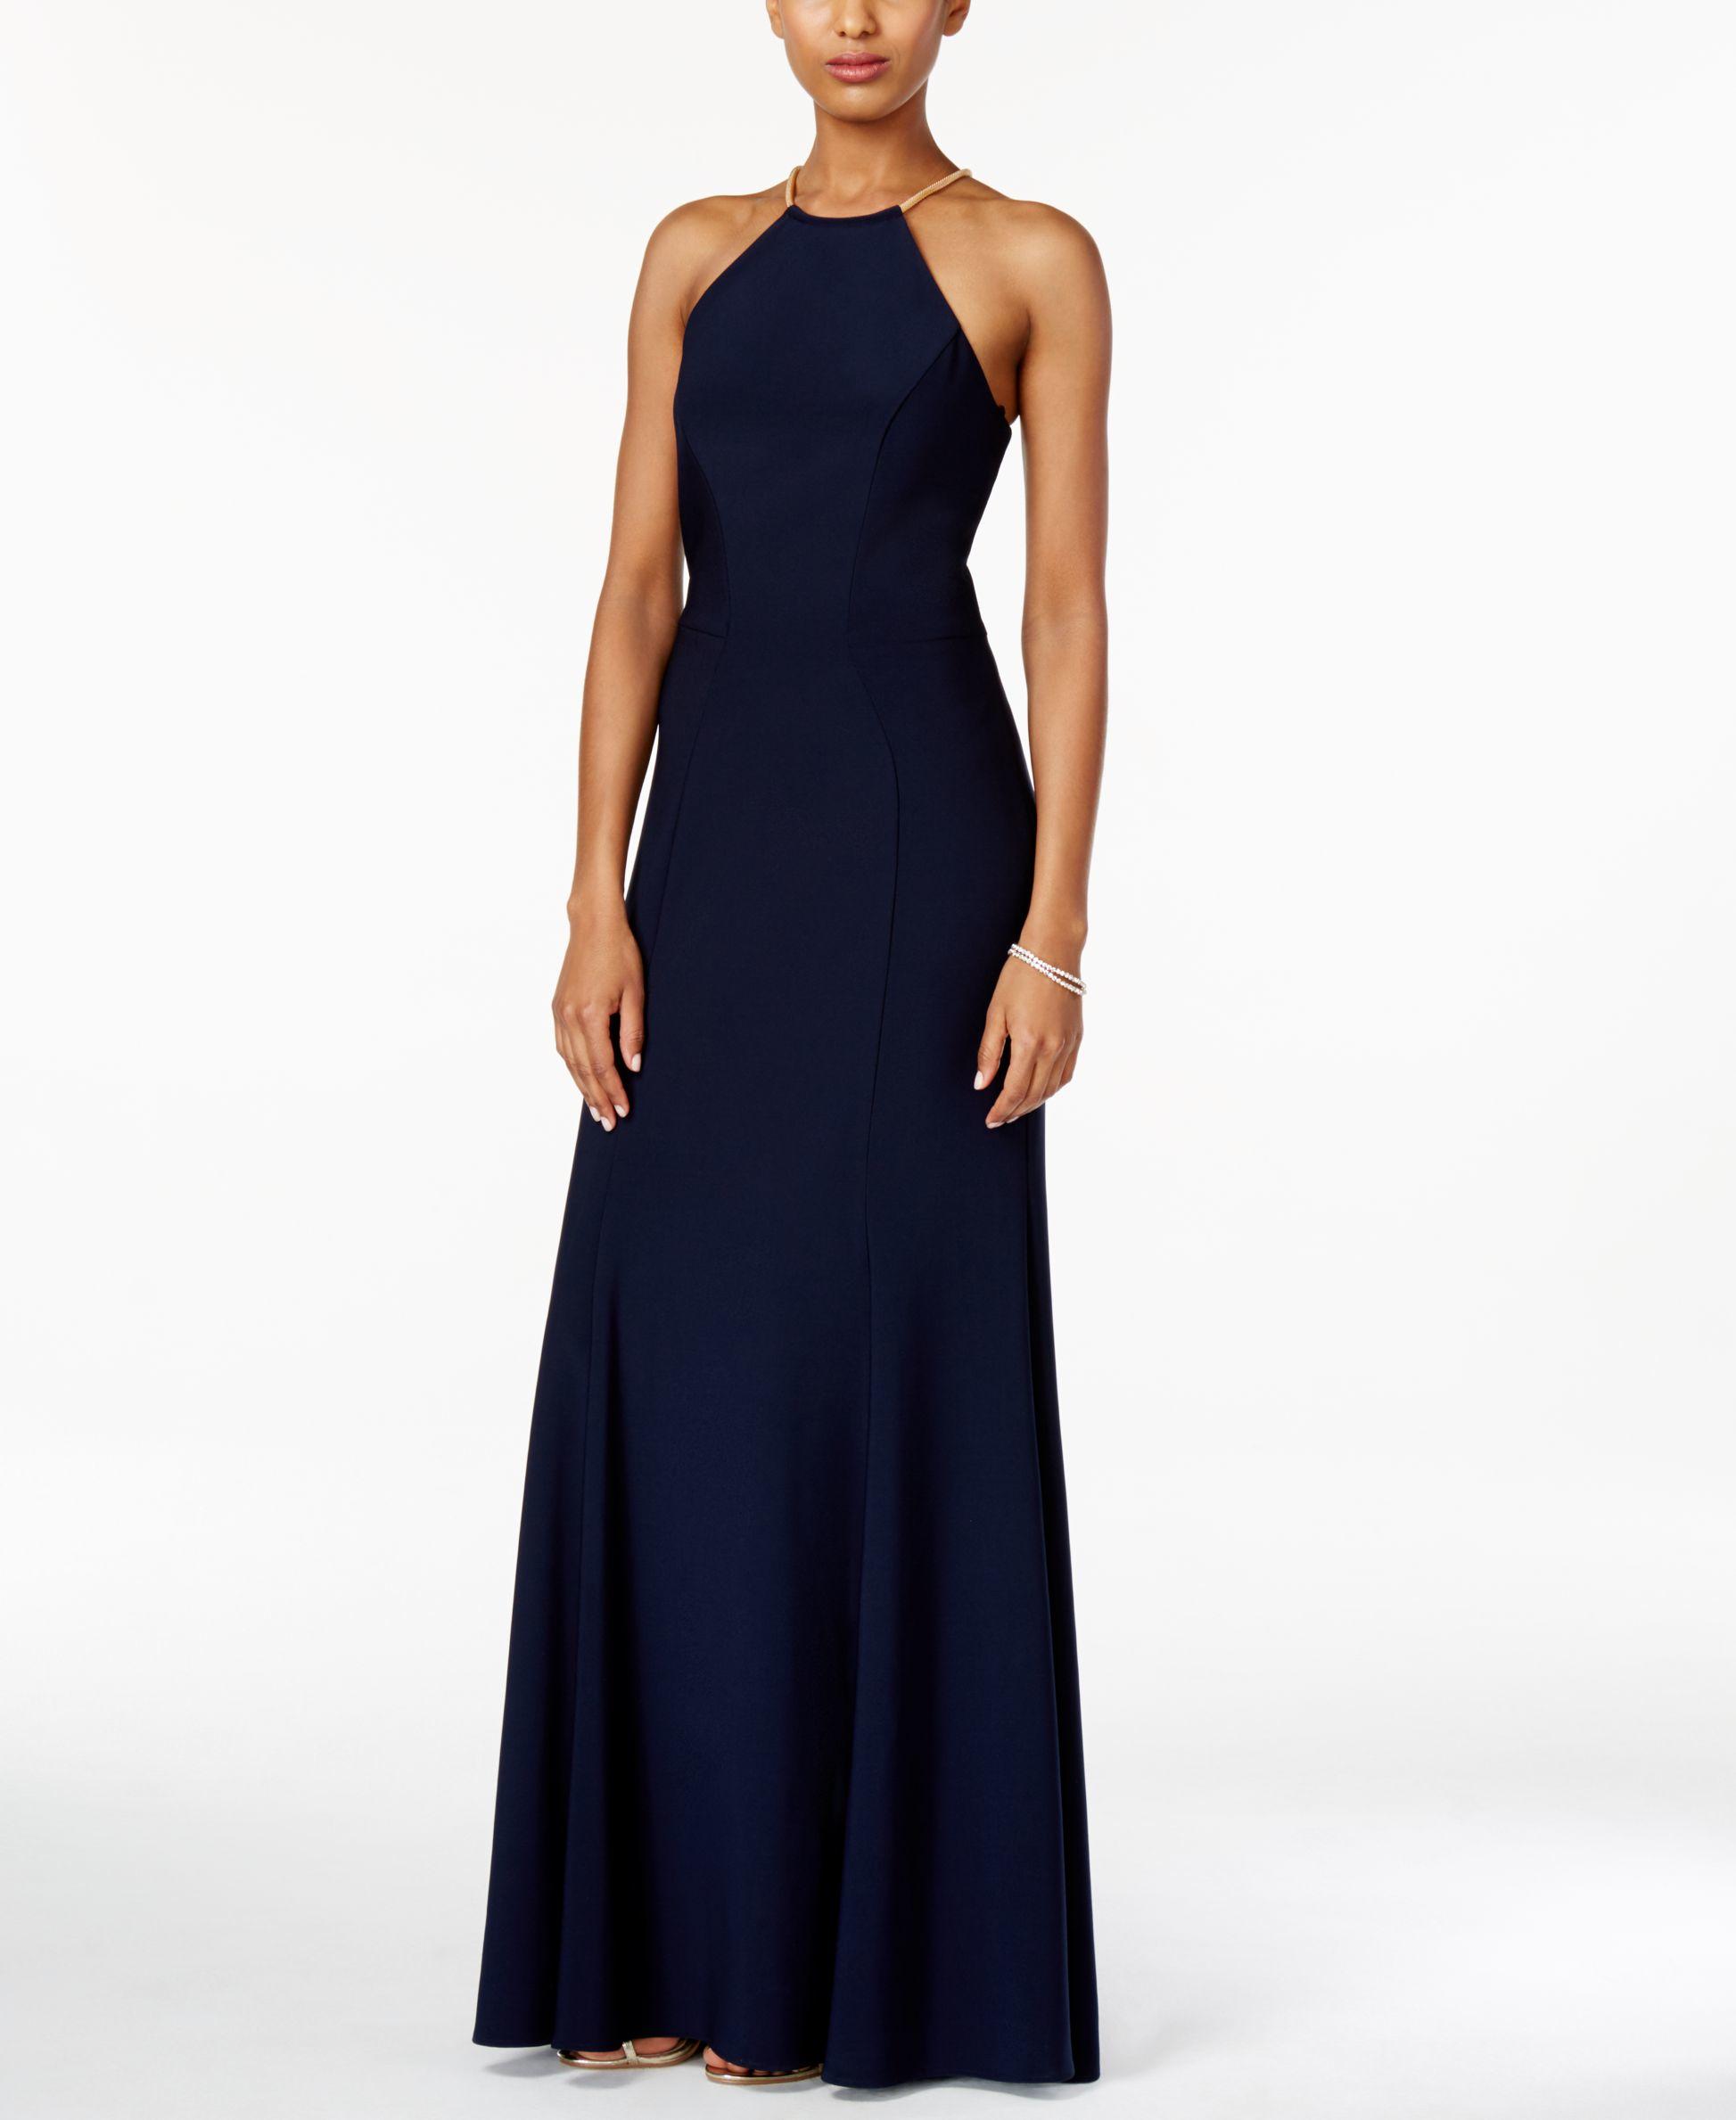 Macys Navy Blue Dresses: Xscape Embellished Halter Gown In Blue